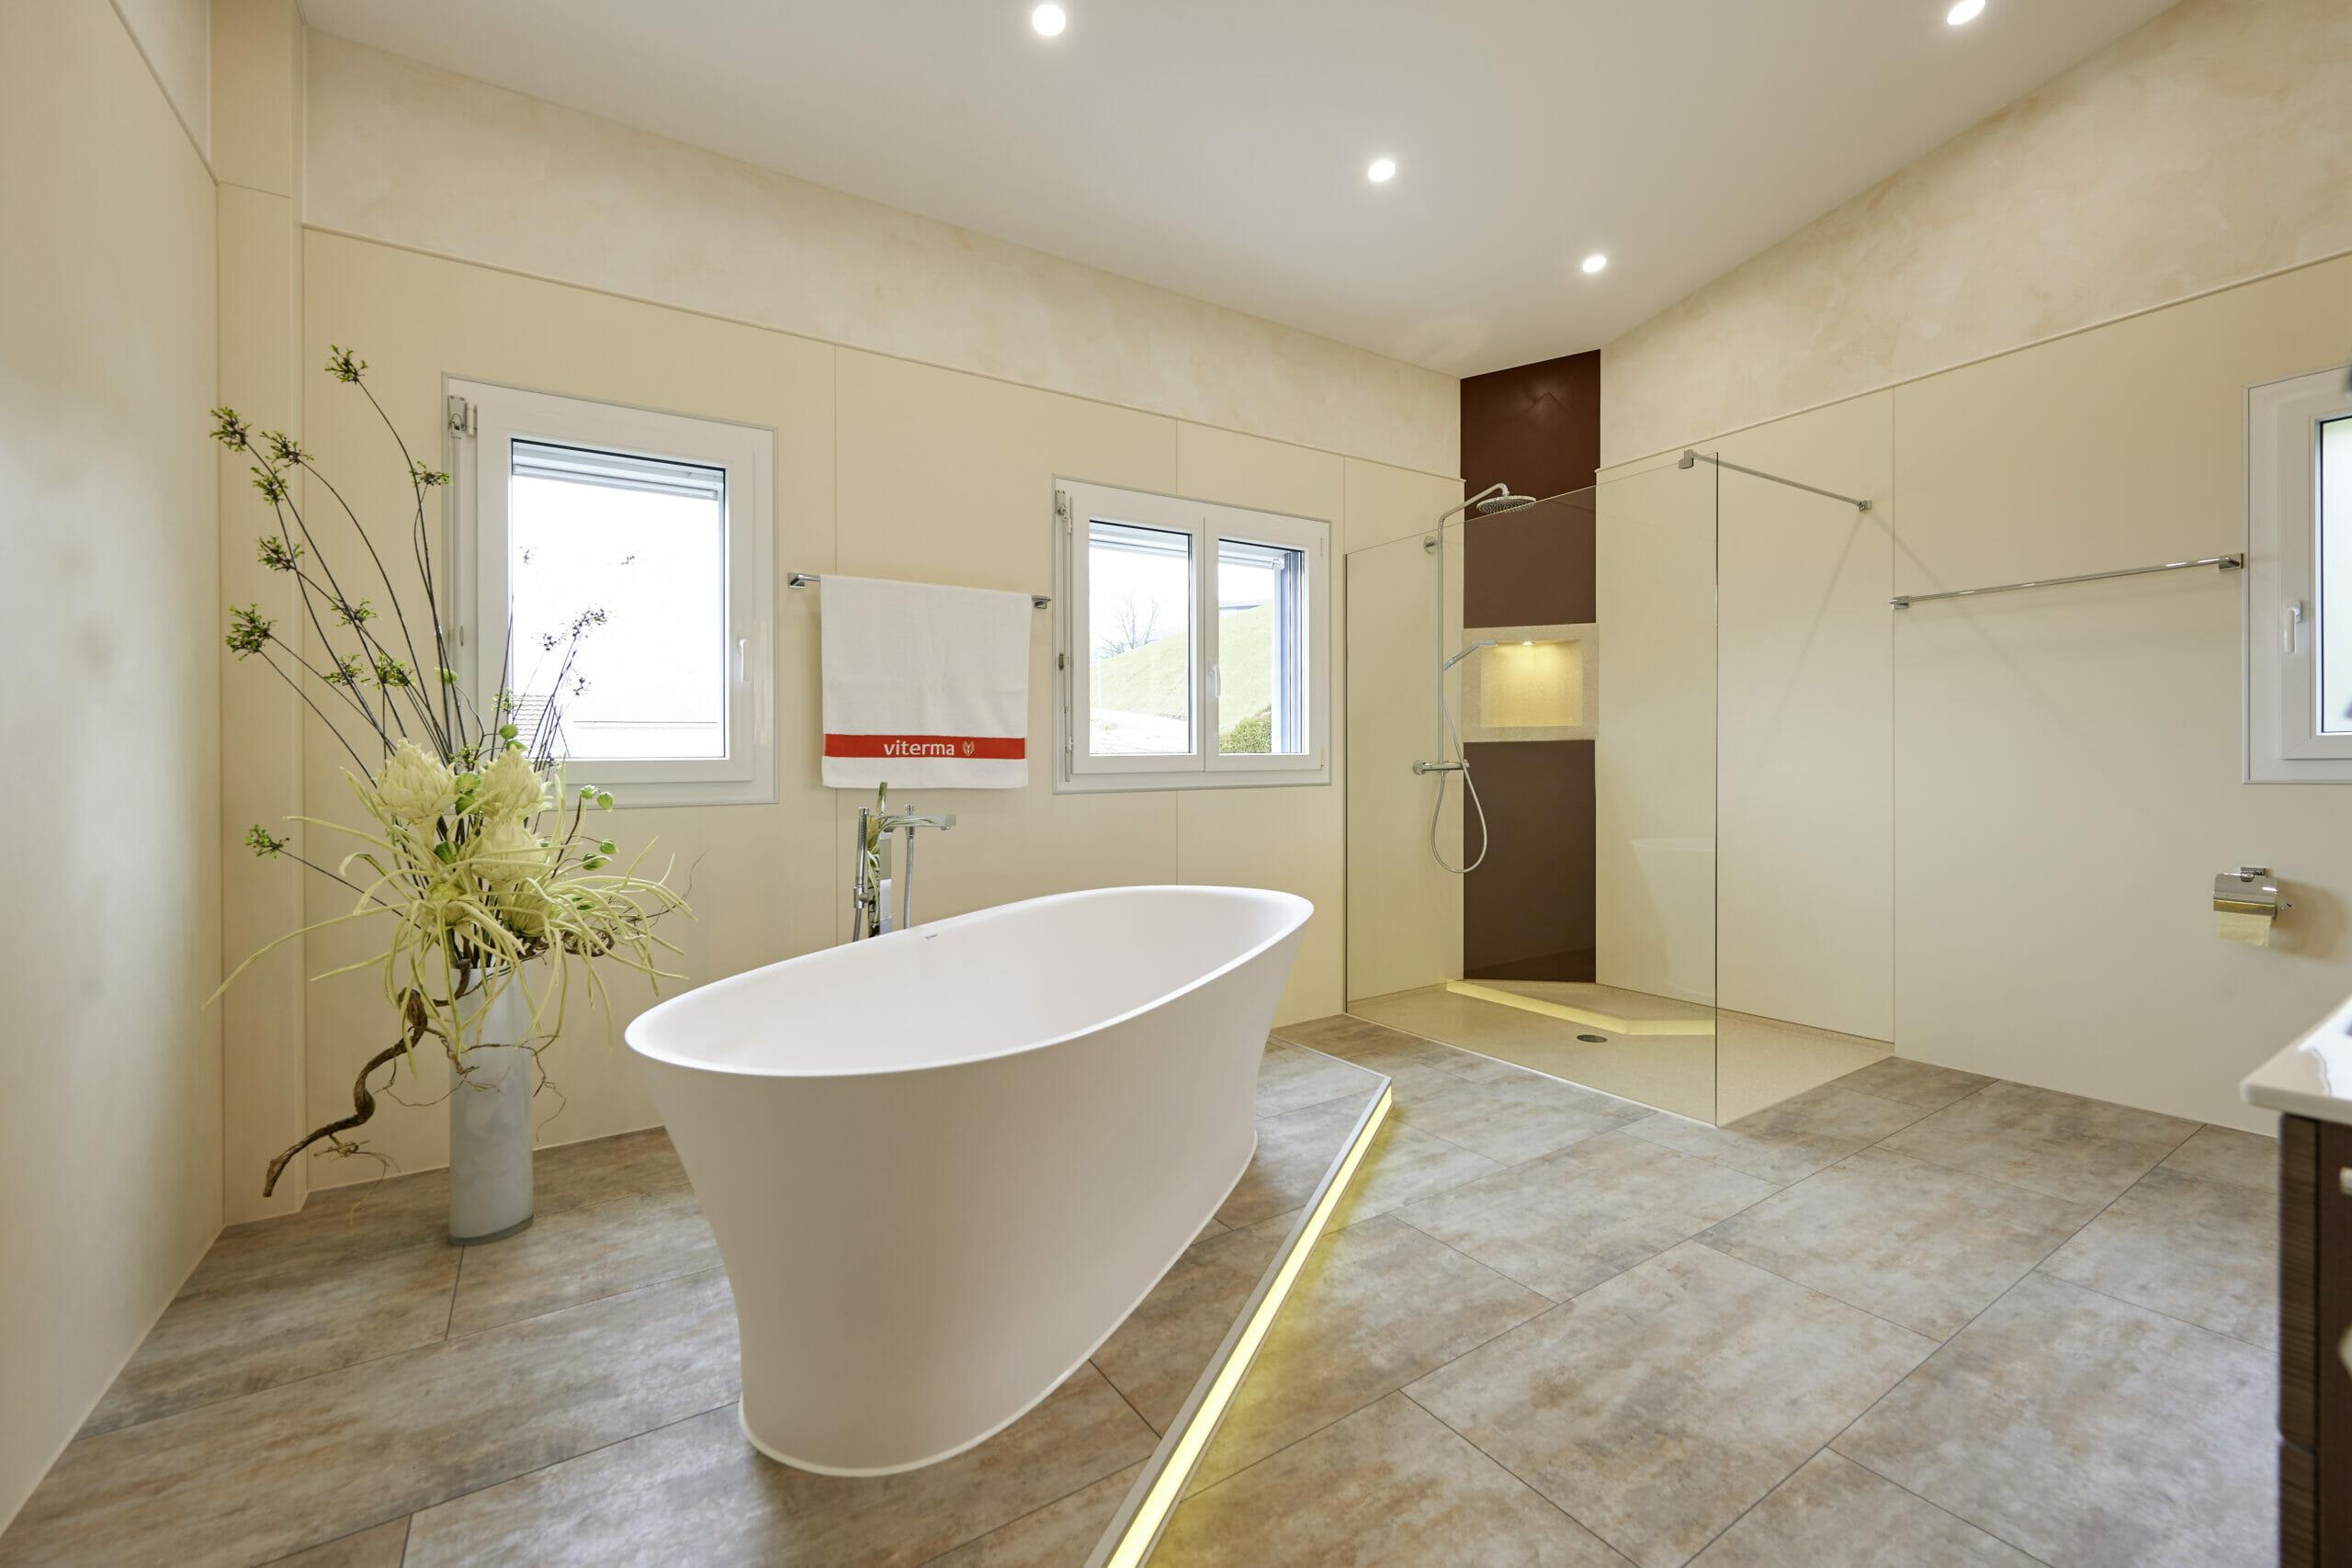 Badezimmer Ideen große Bäder